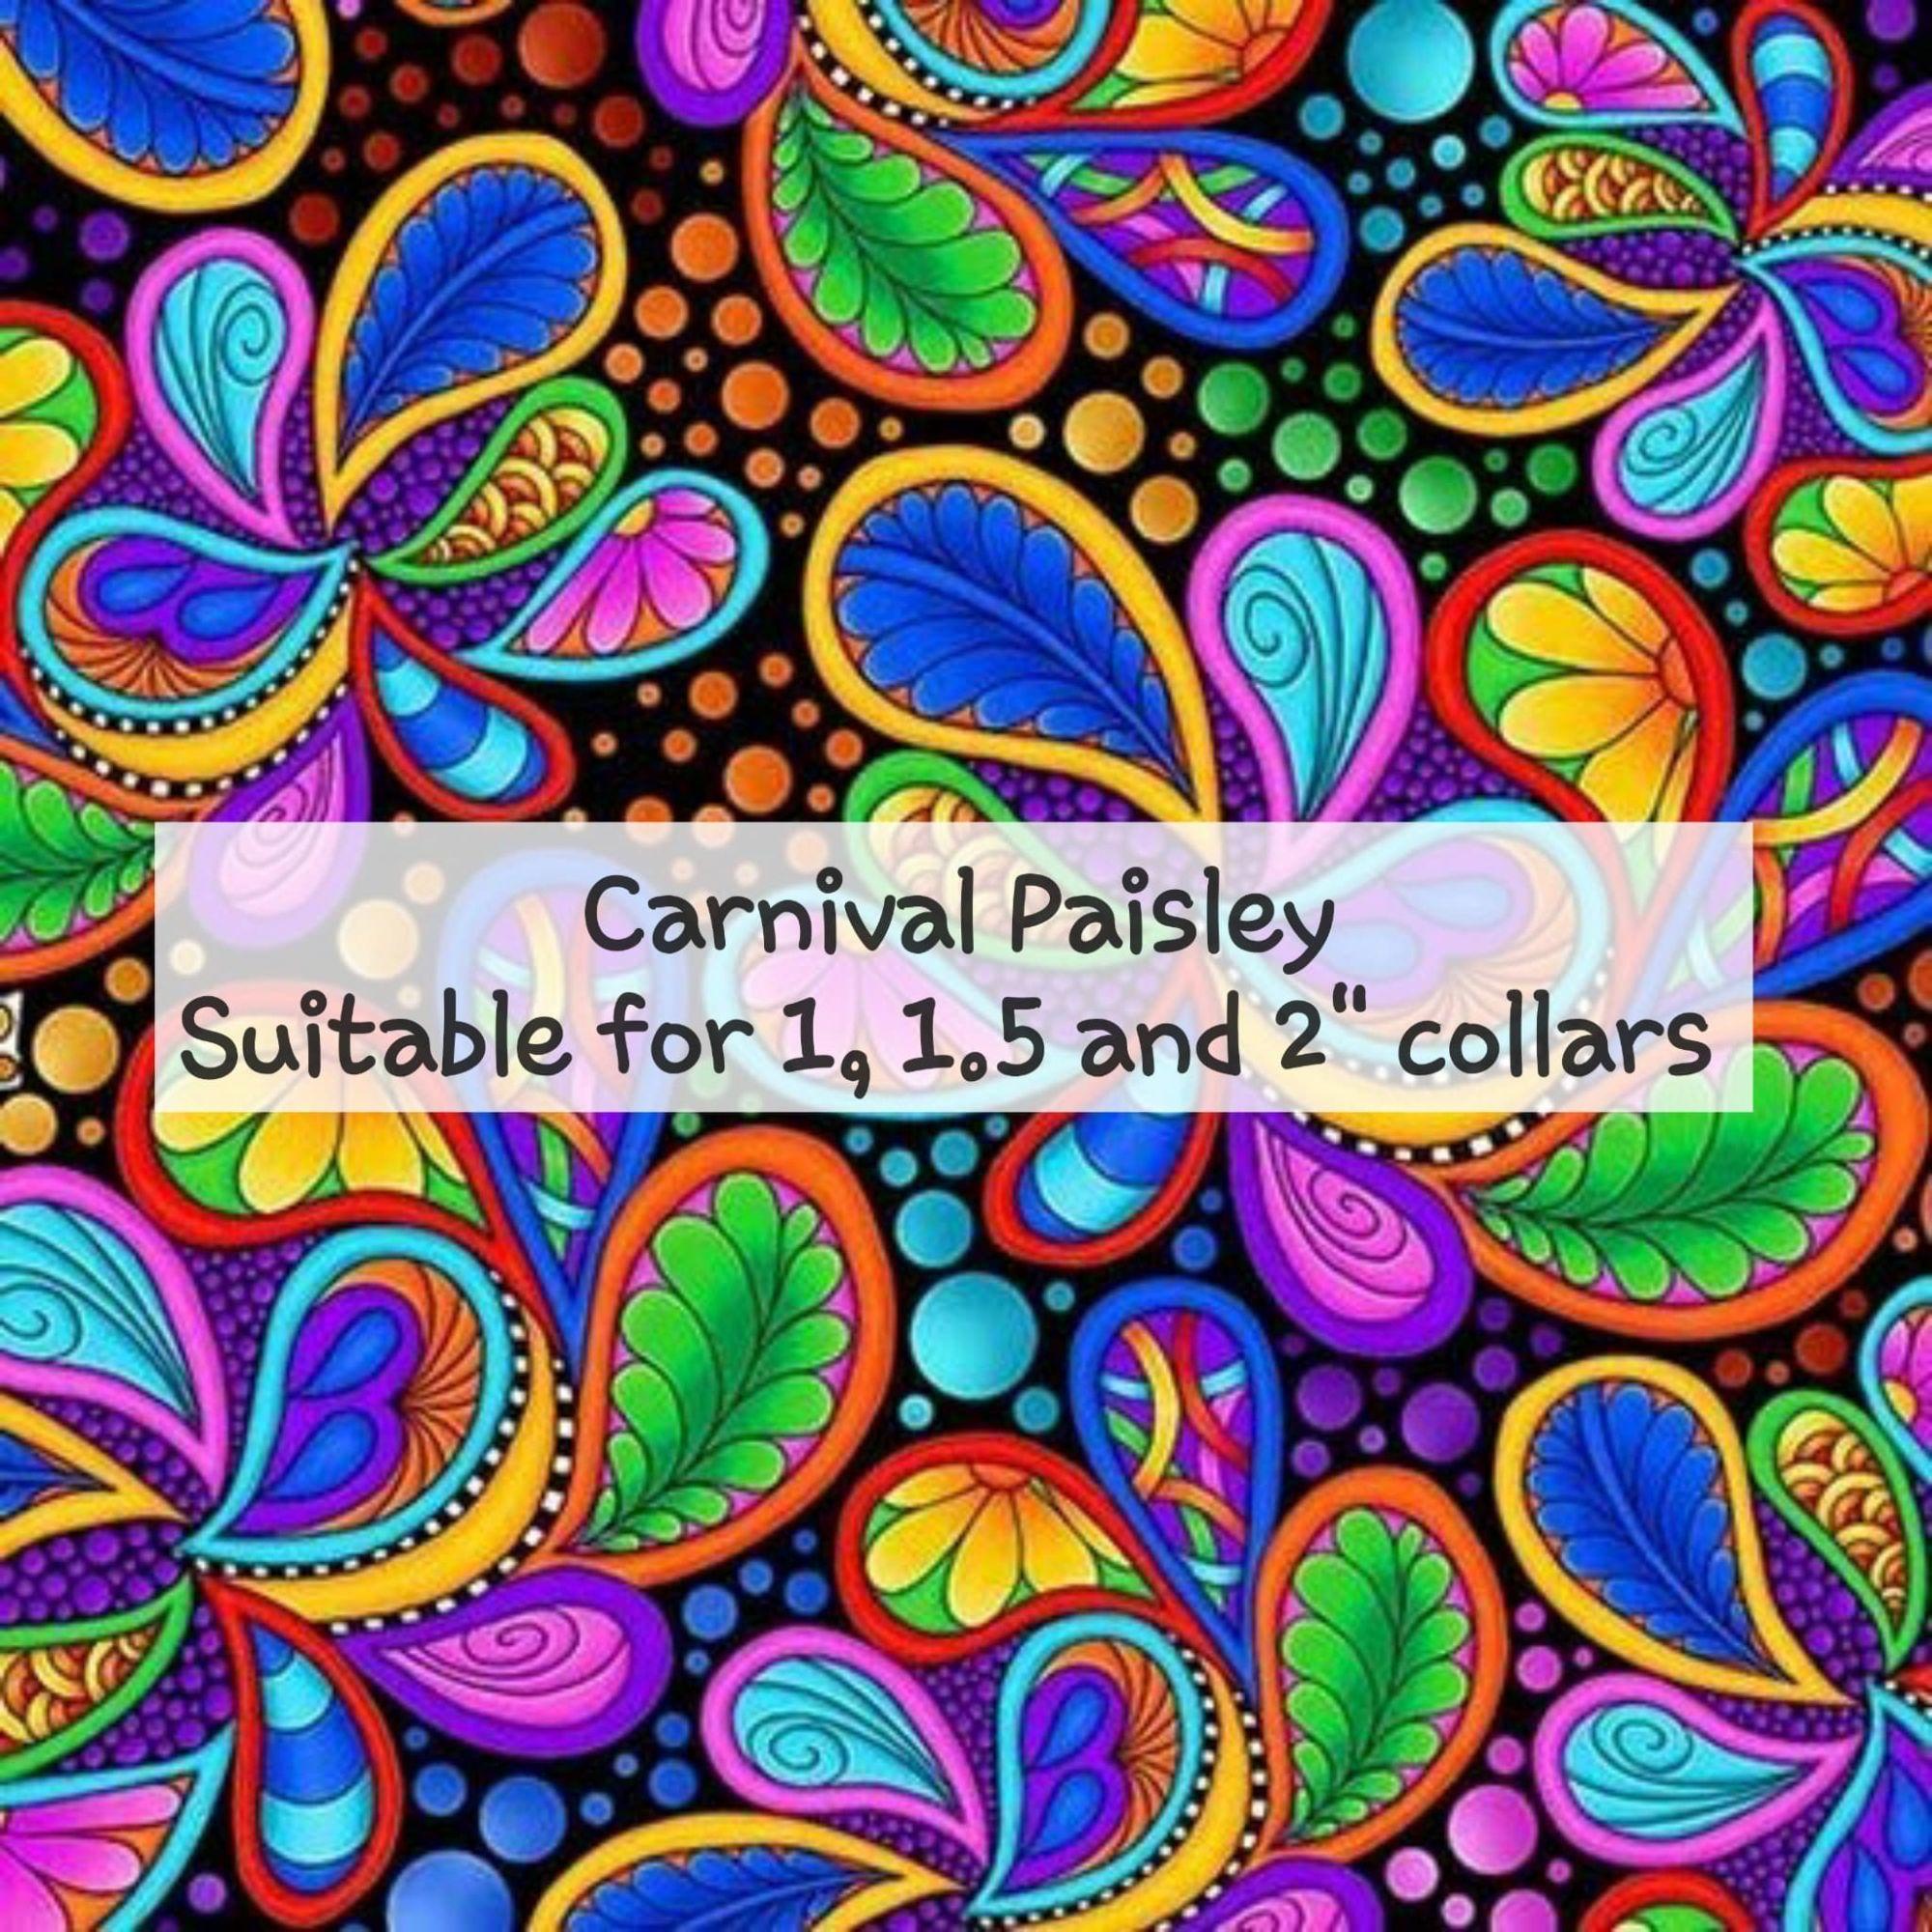 Carnival Paisley